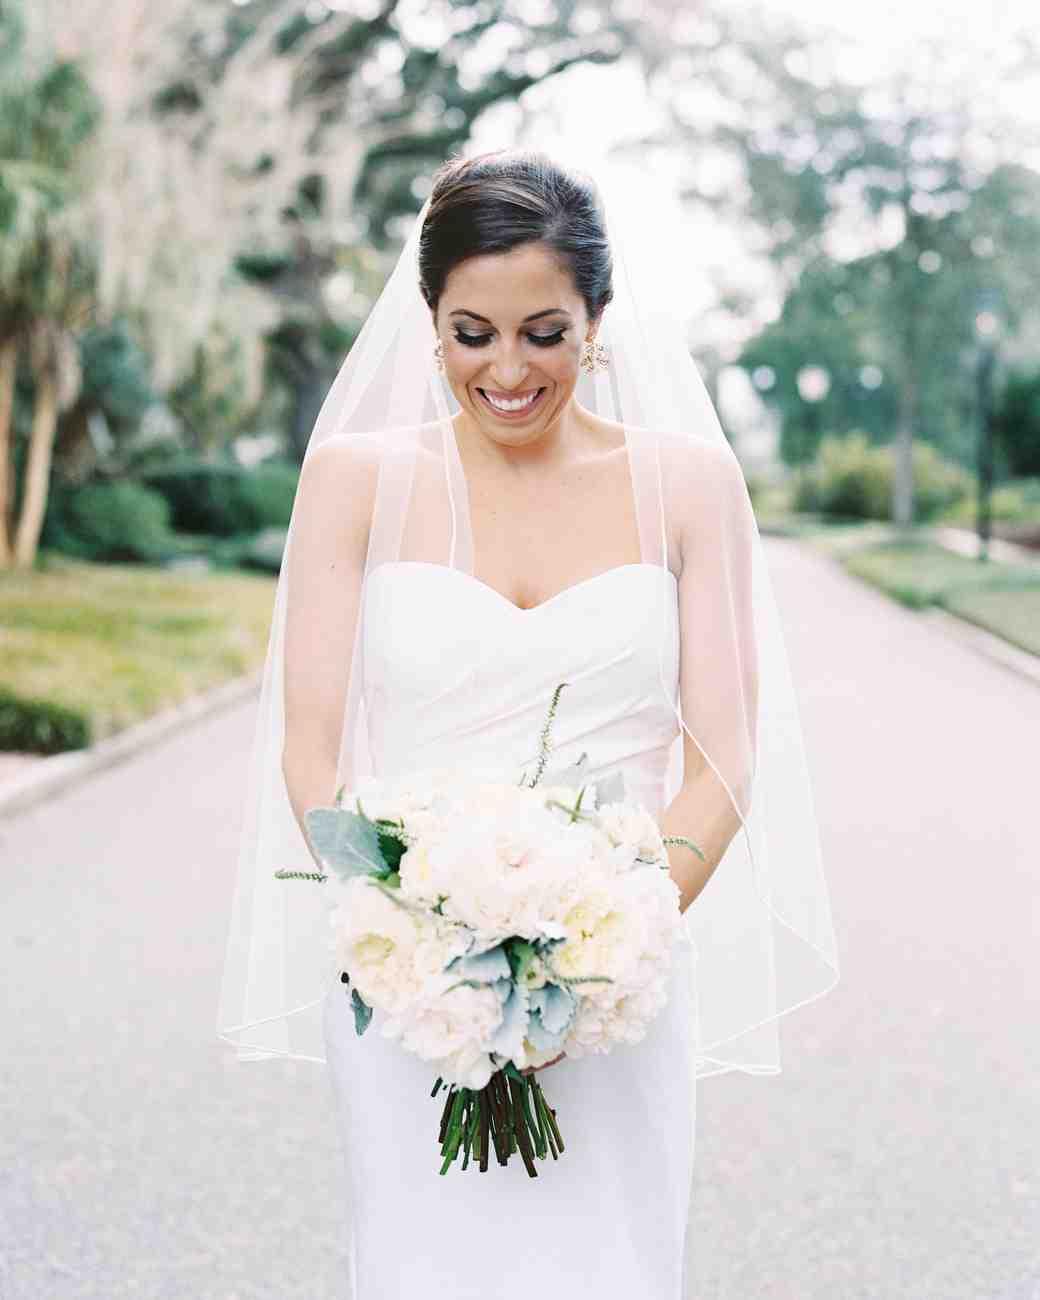 taylor-john-wedding-bouquet-1-s113035-0616.jpg